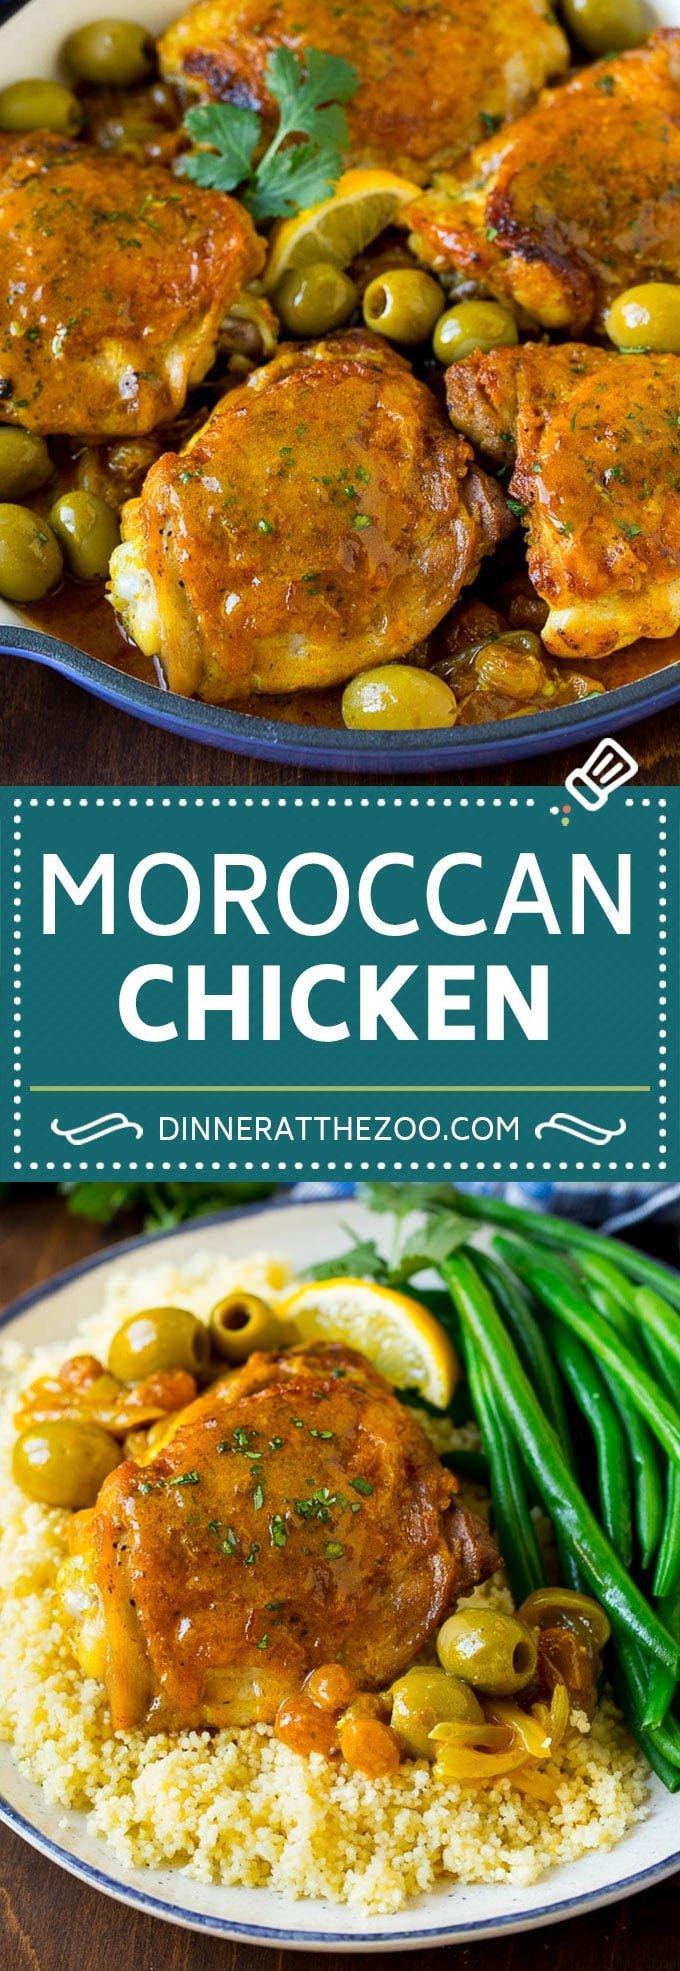 Moroccan Chicken Recipe #chicken #dinner #olives #dinneratthezoo